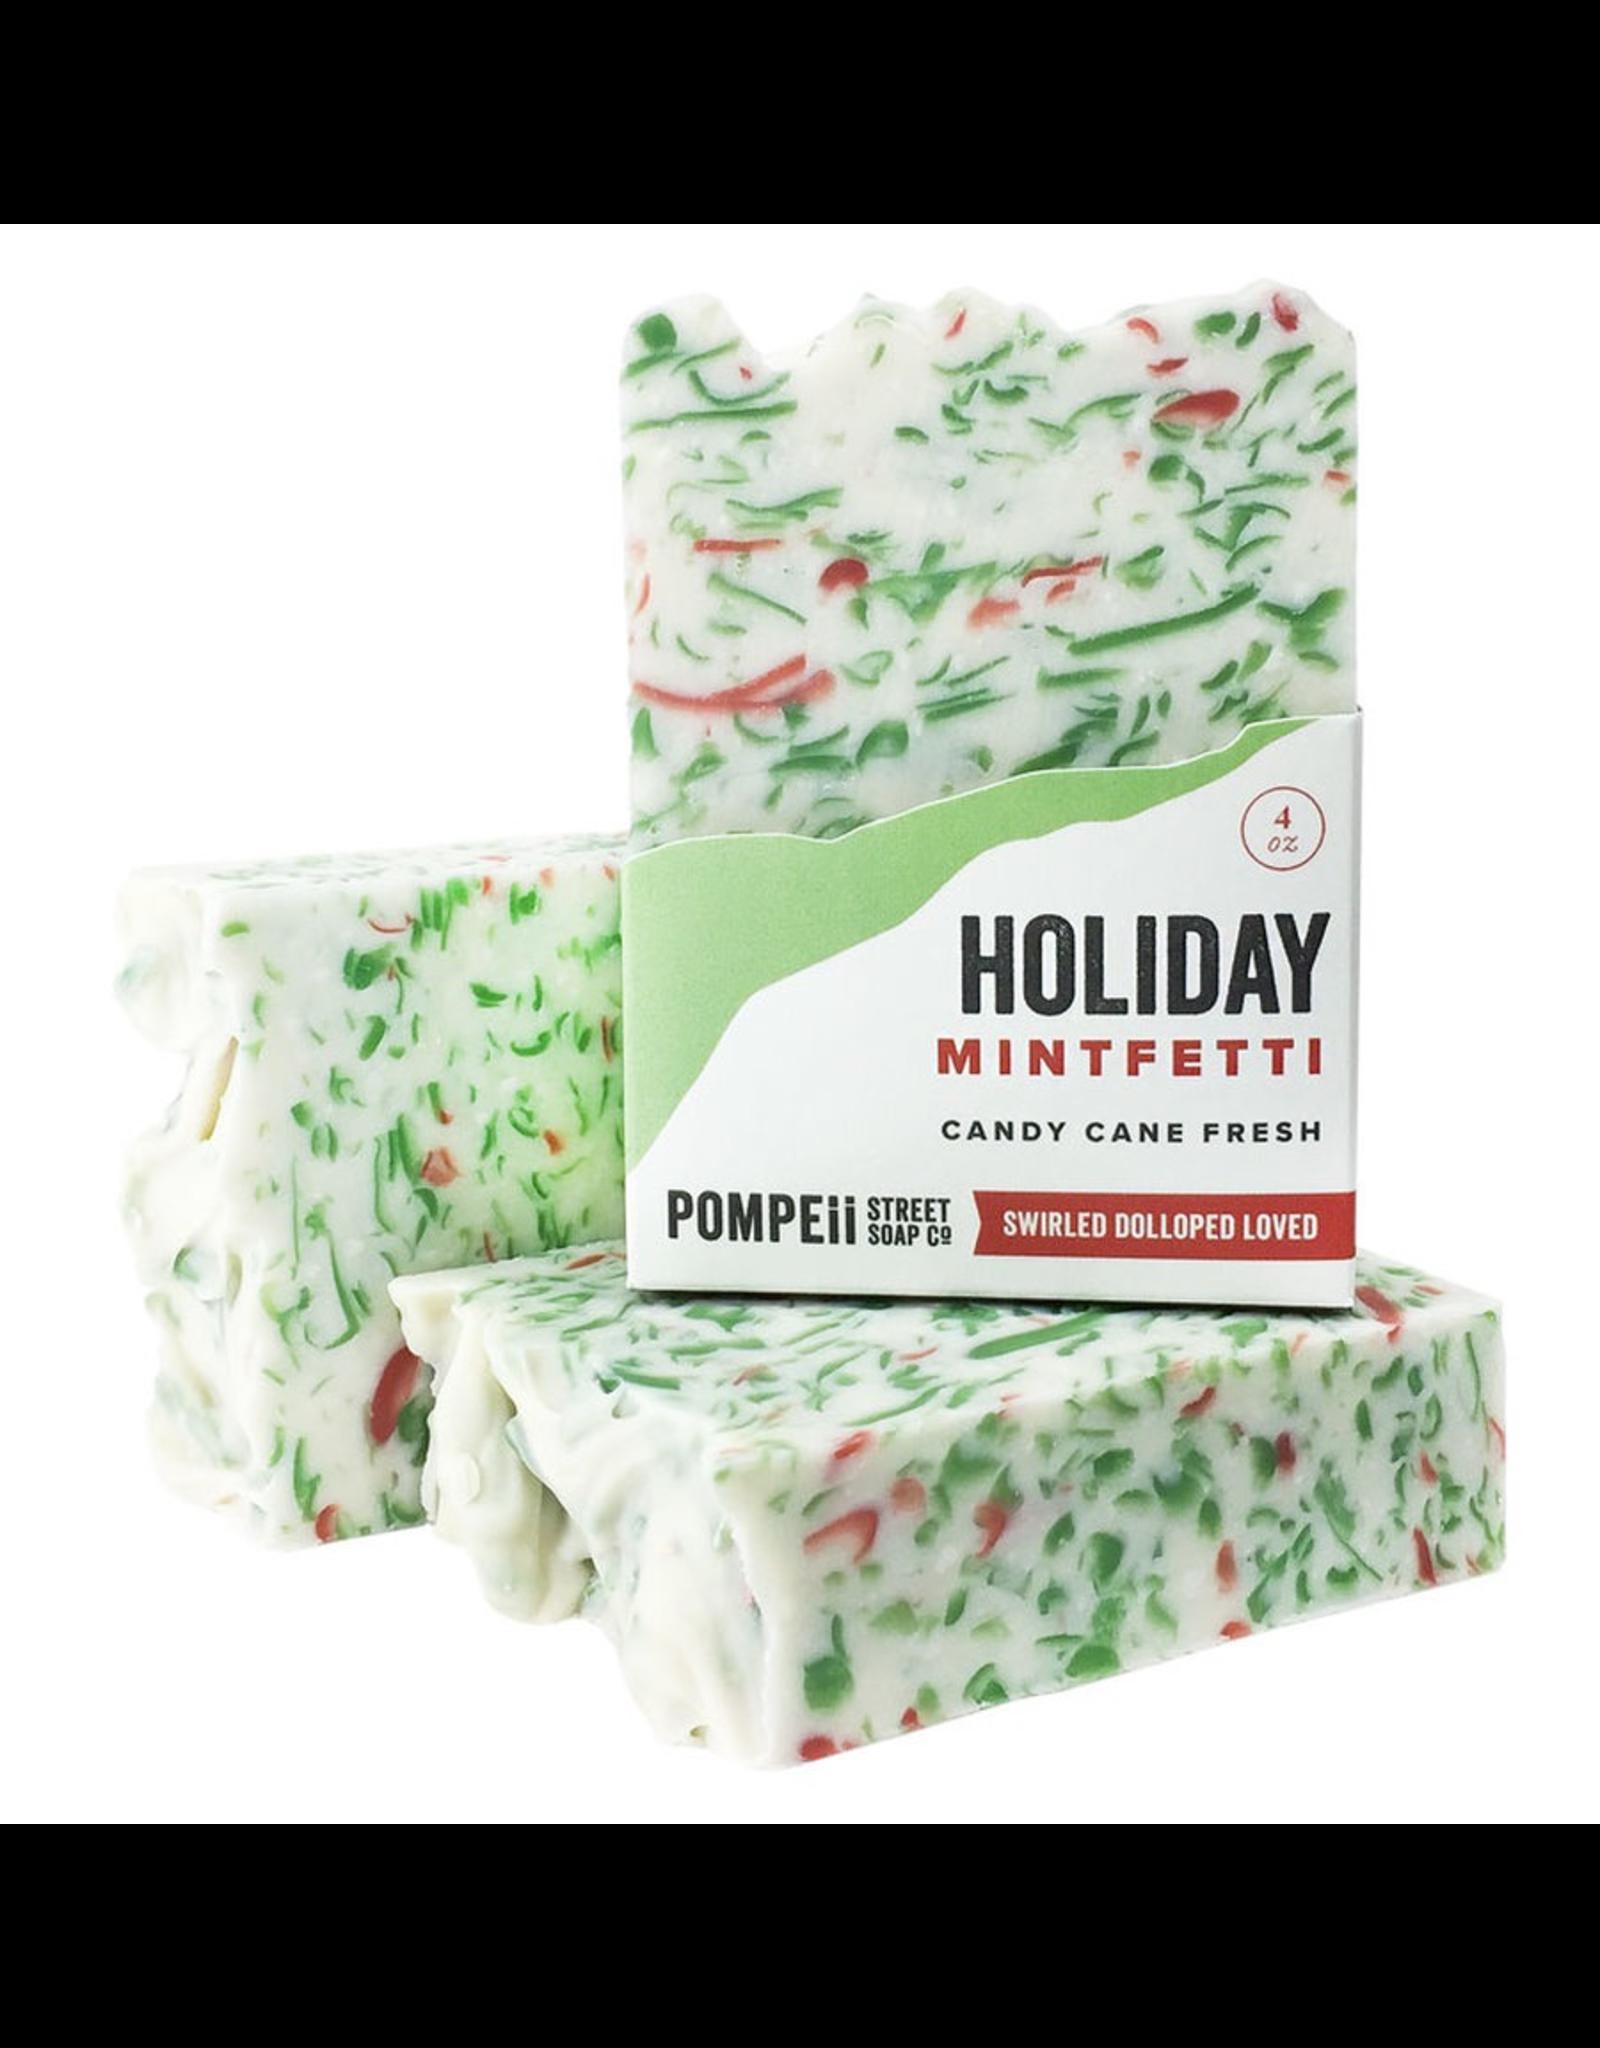 Pompeii Holiday Peppermint Soap 4 oz.